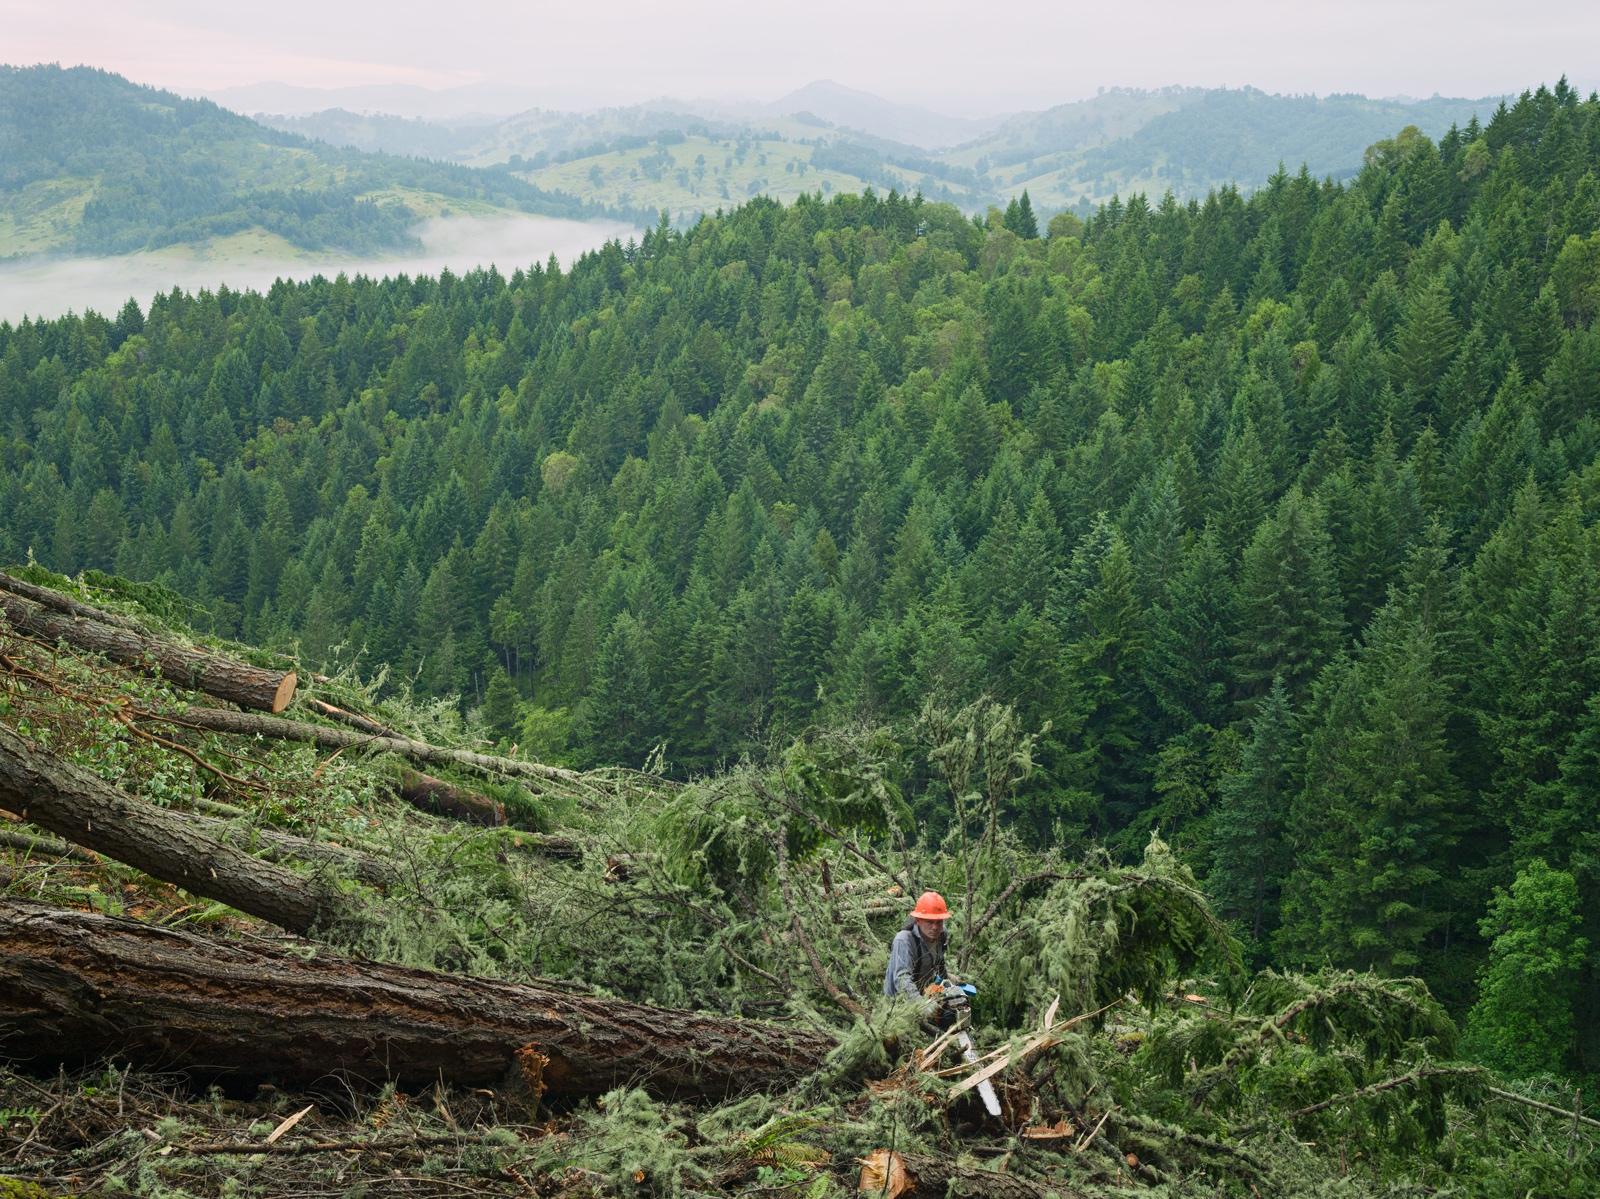 Joel clearcutting a forest planted 60 years earlier, Oregon. © Lucas Foglia, courtesy of Michael Hoppen Gallery, London.